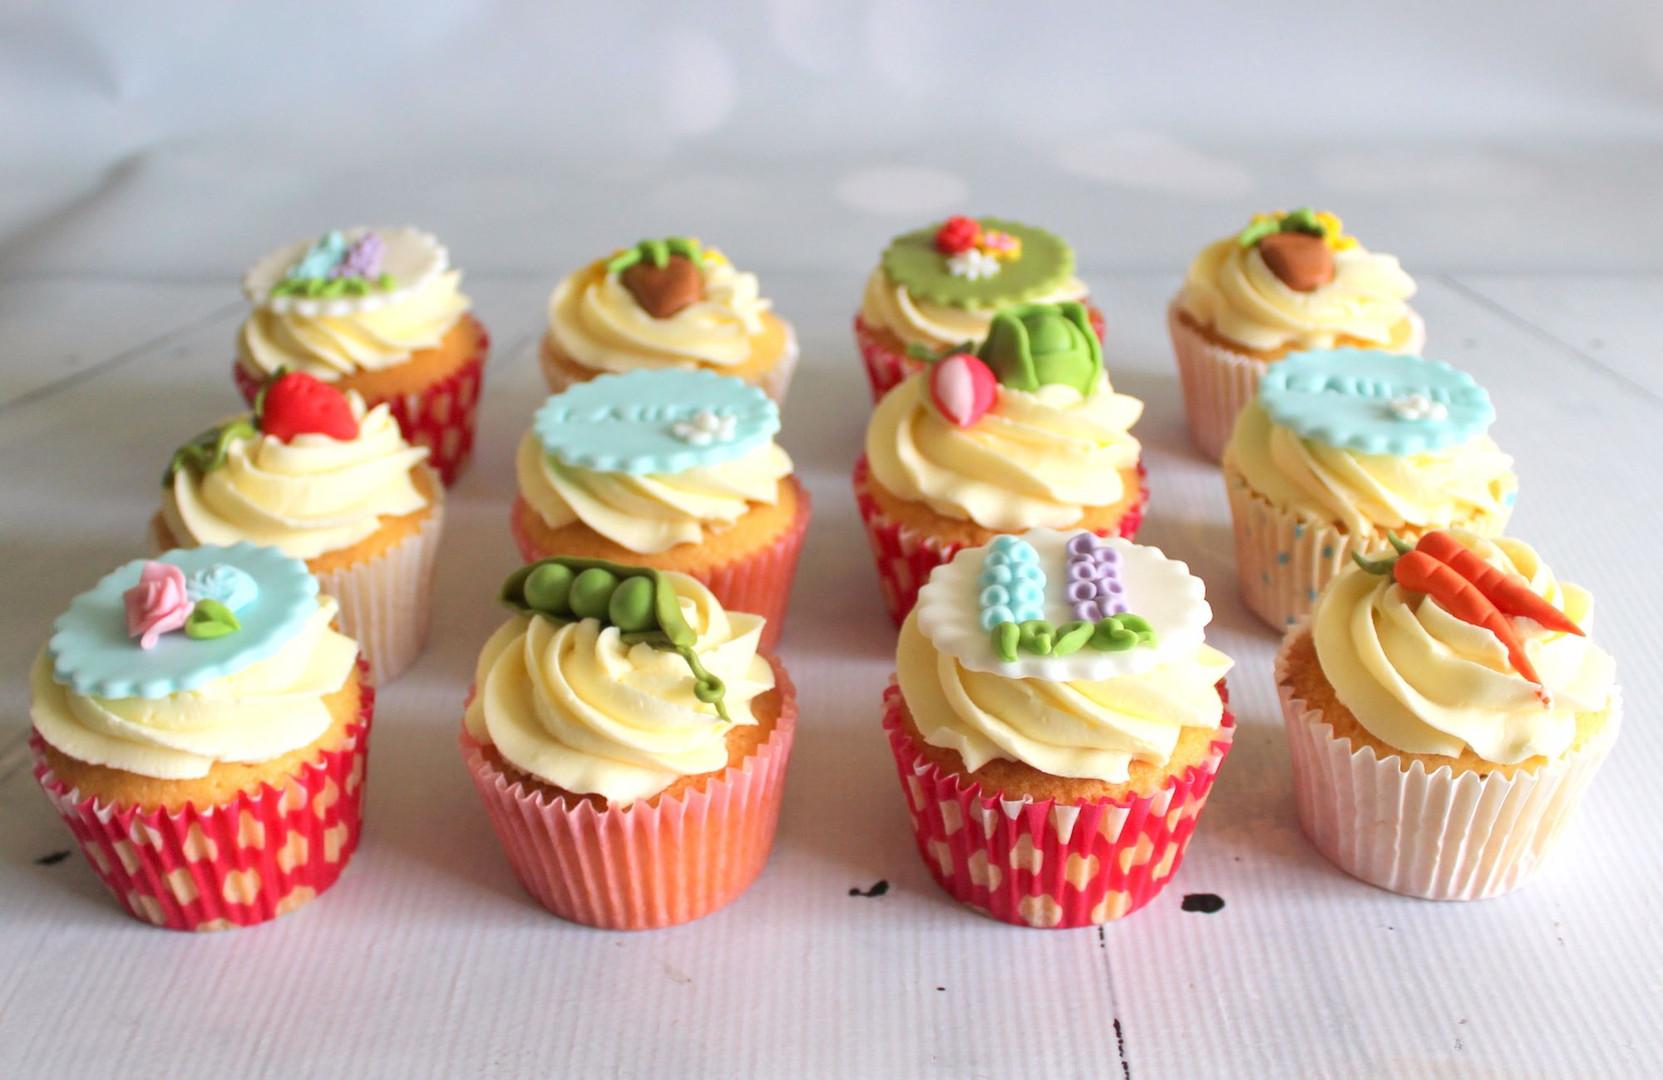 Garden Patch Cupcakes.jpg